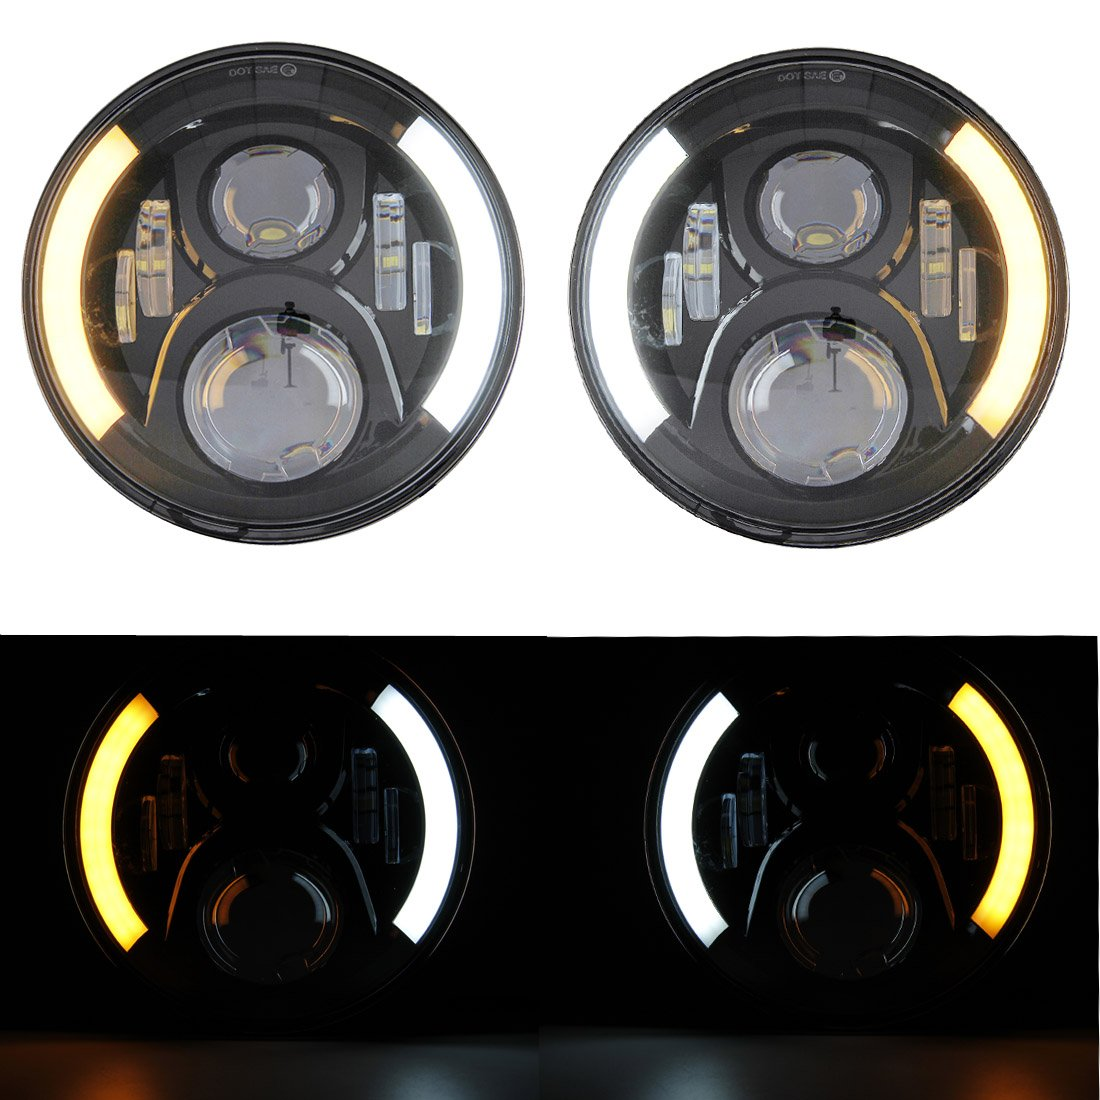 HOZAN Black 5.75 5-3//4inch LED Motorcycle Headlight White DRL with Headlight Housing for Kawasaki Honda Shadow Harley Suzuki Motorbikes Metric bikes Cruisers Choppers